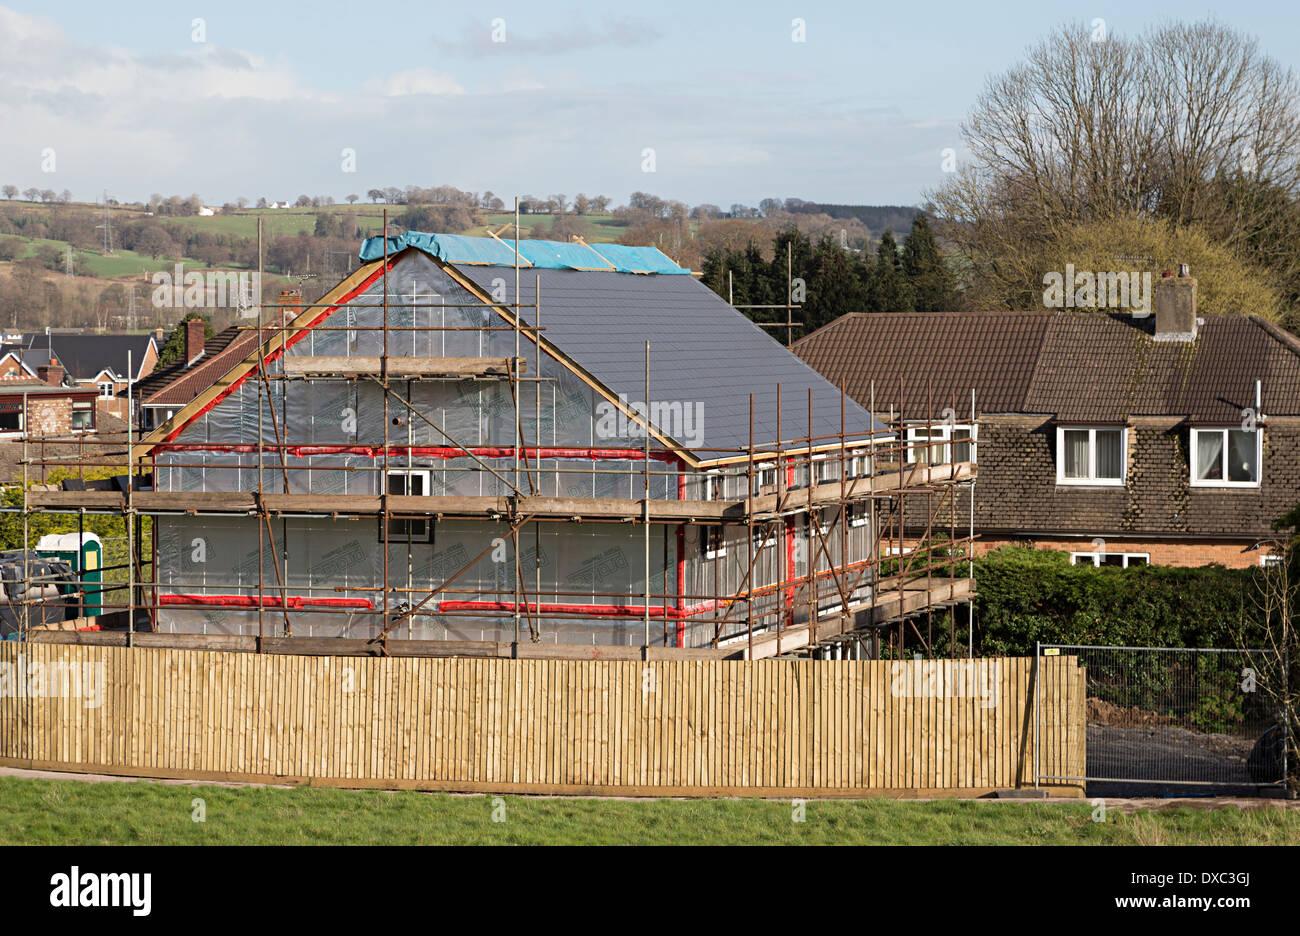 New build house under construction in village, Llanfoist, Abergavenny, Wales, UK - Stock Image